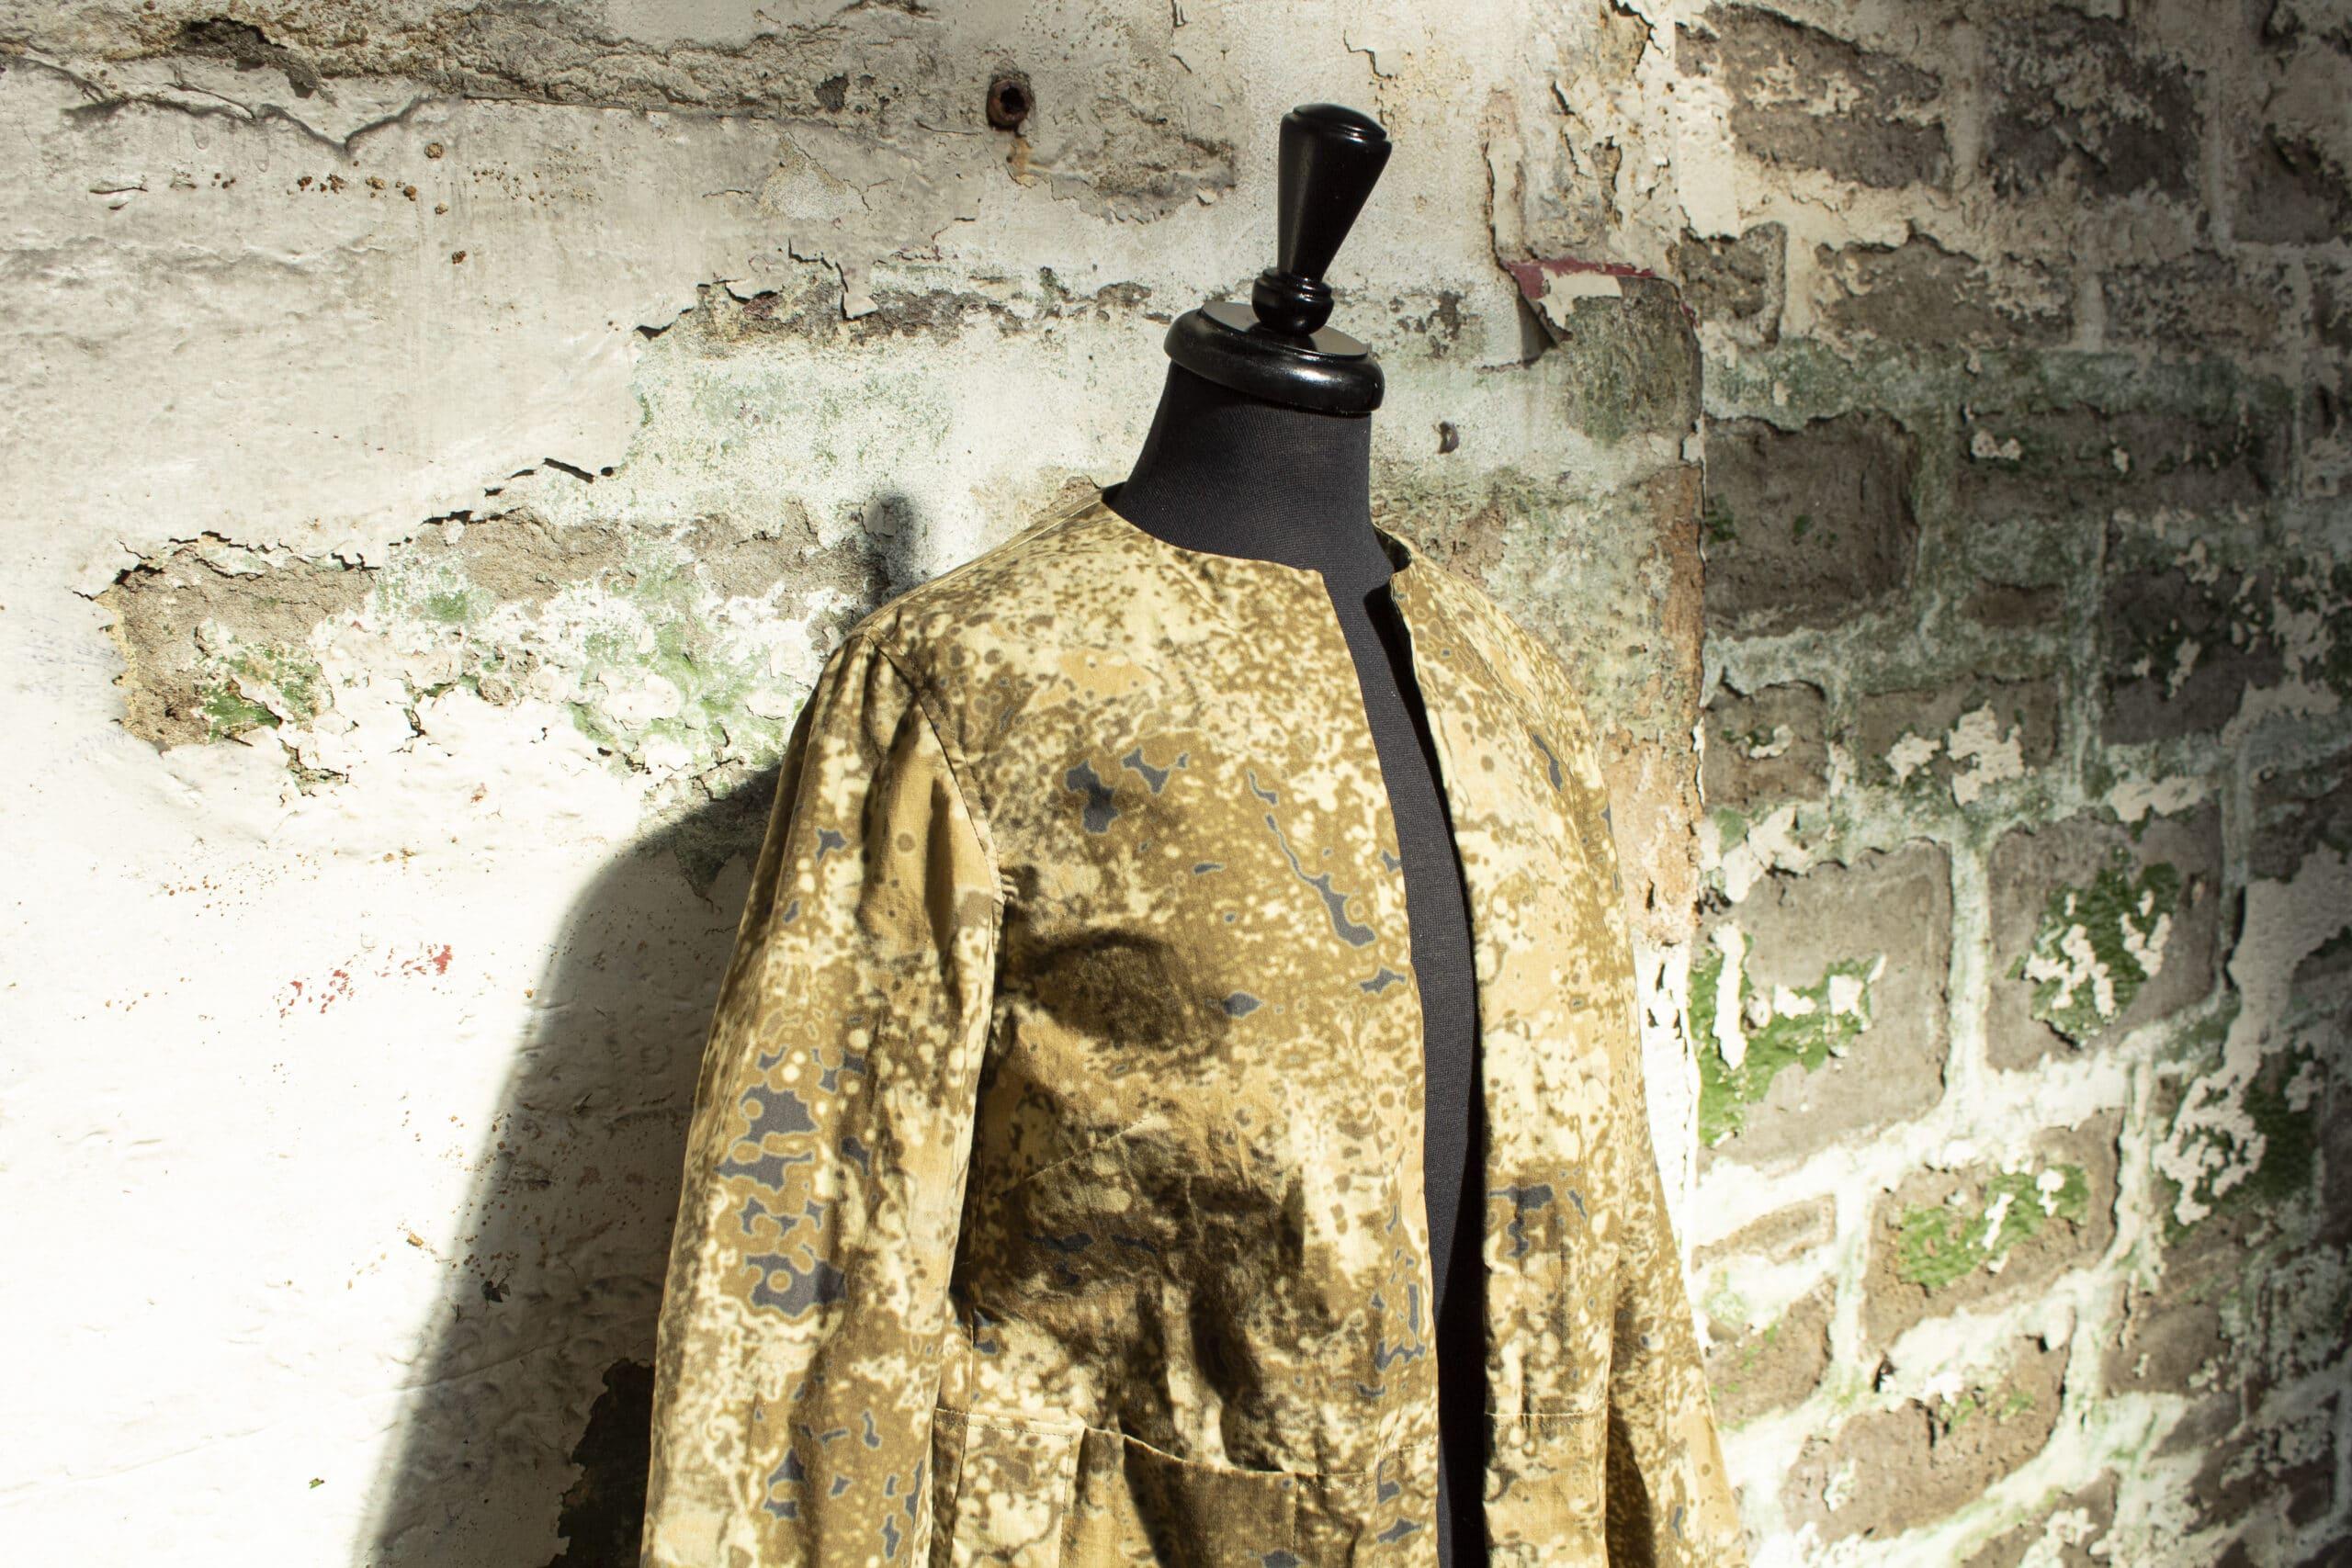 R140 Hybrid/Aero Tempest Print Tan waxed jacket